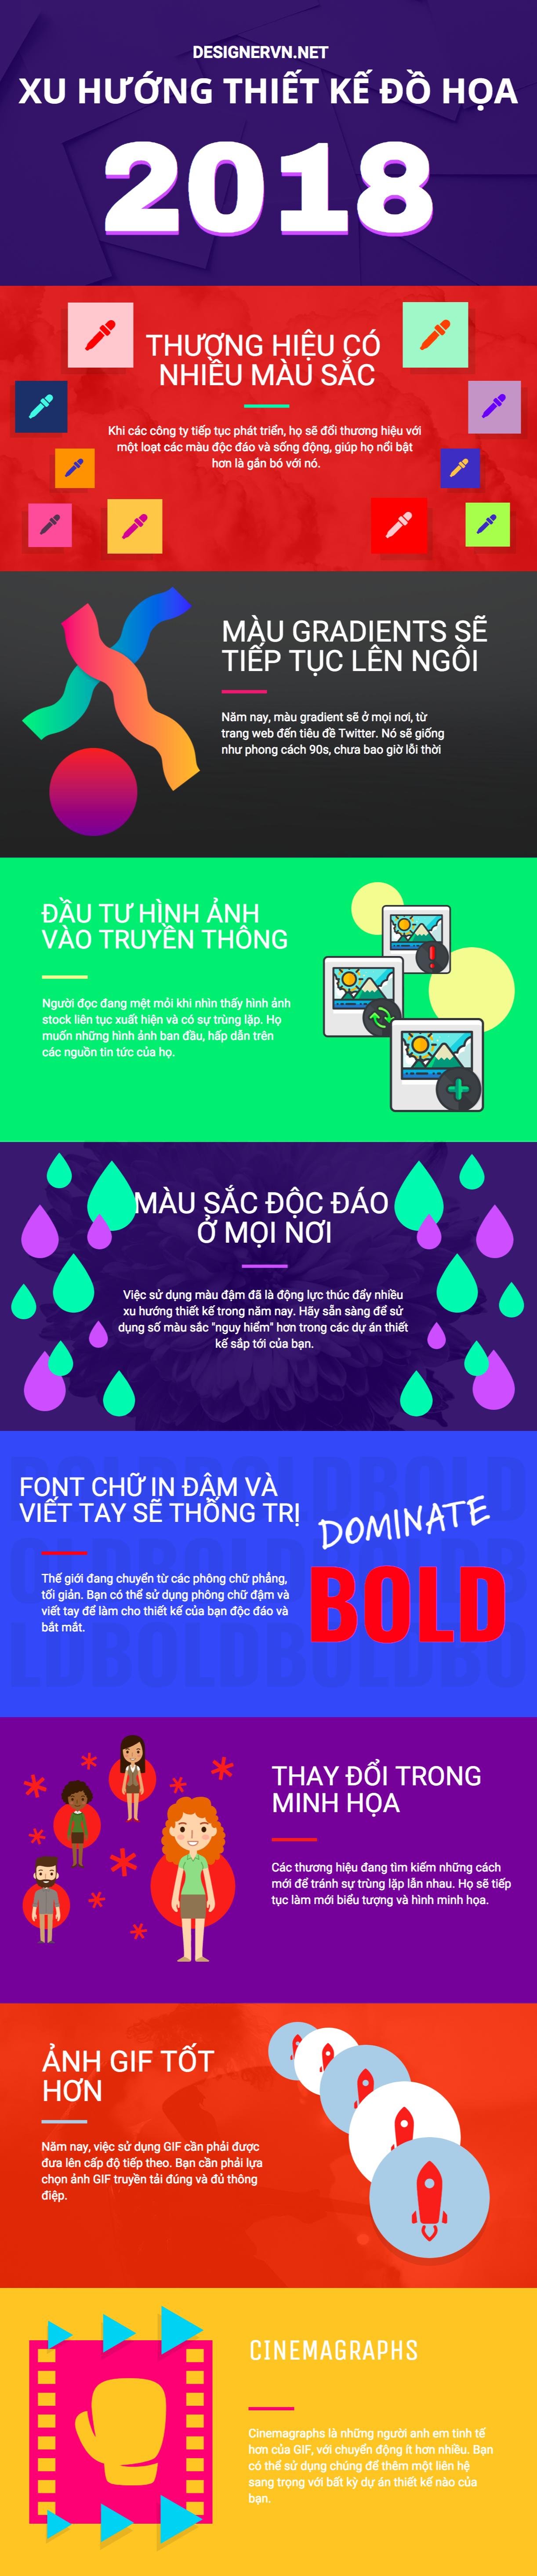 Design Trends 2018 - by Hào Trương [Infographic  (1).